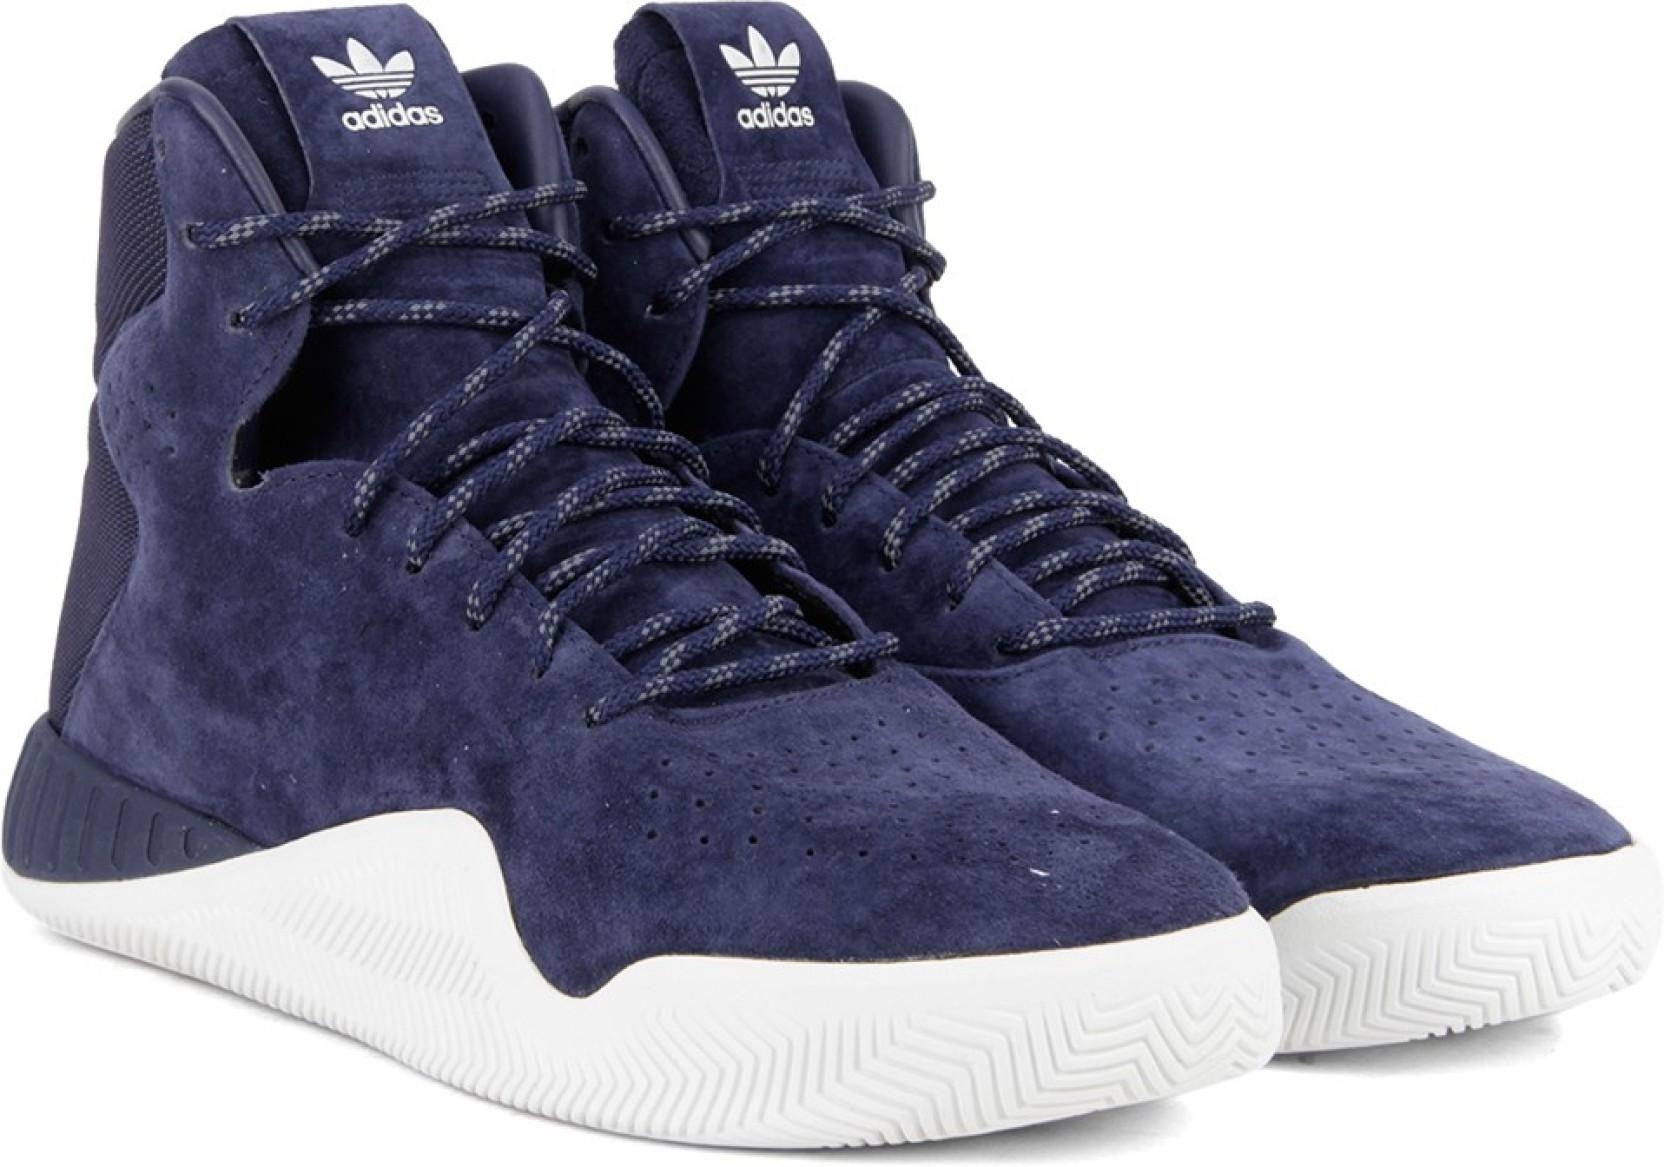 9832b6330f2d ADIDAS ORIGINALS TUBULAR INSTINCT Sneakers For Men - Buy DKBLUE ...